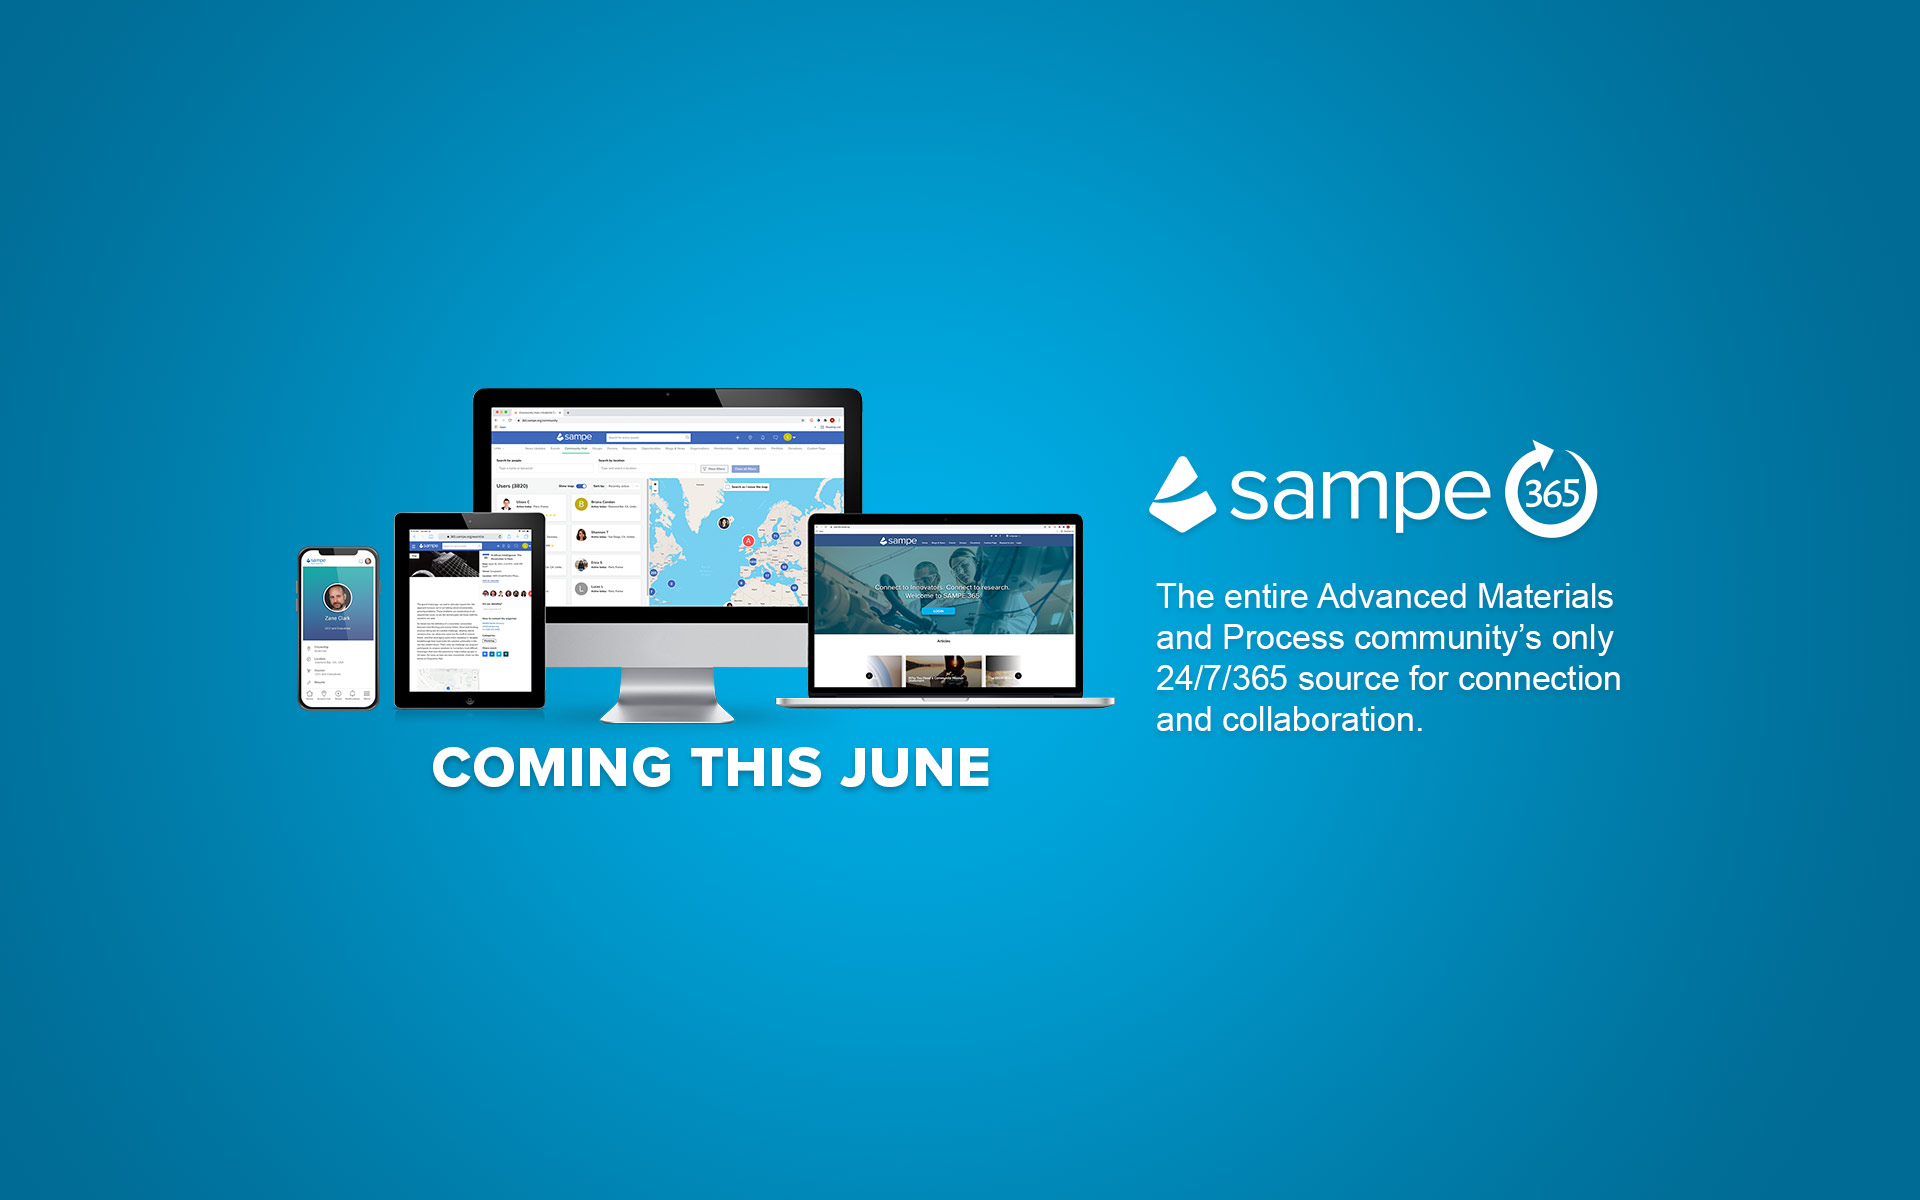 SAMPE 365 Banner